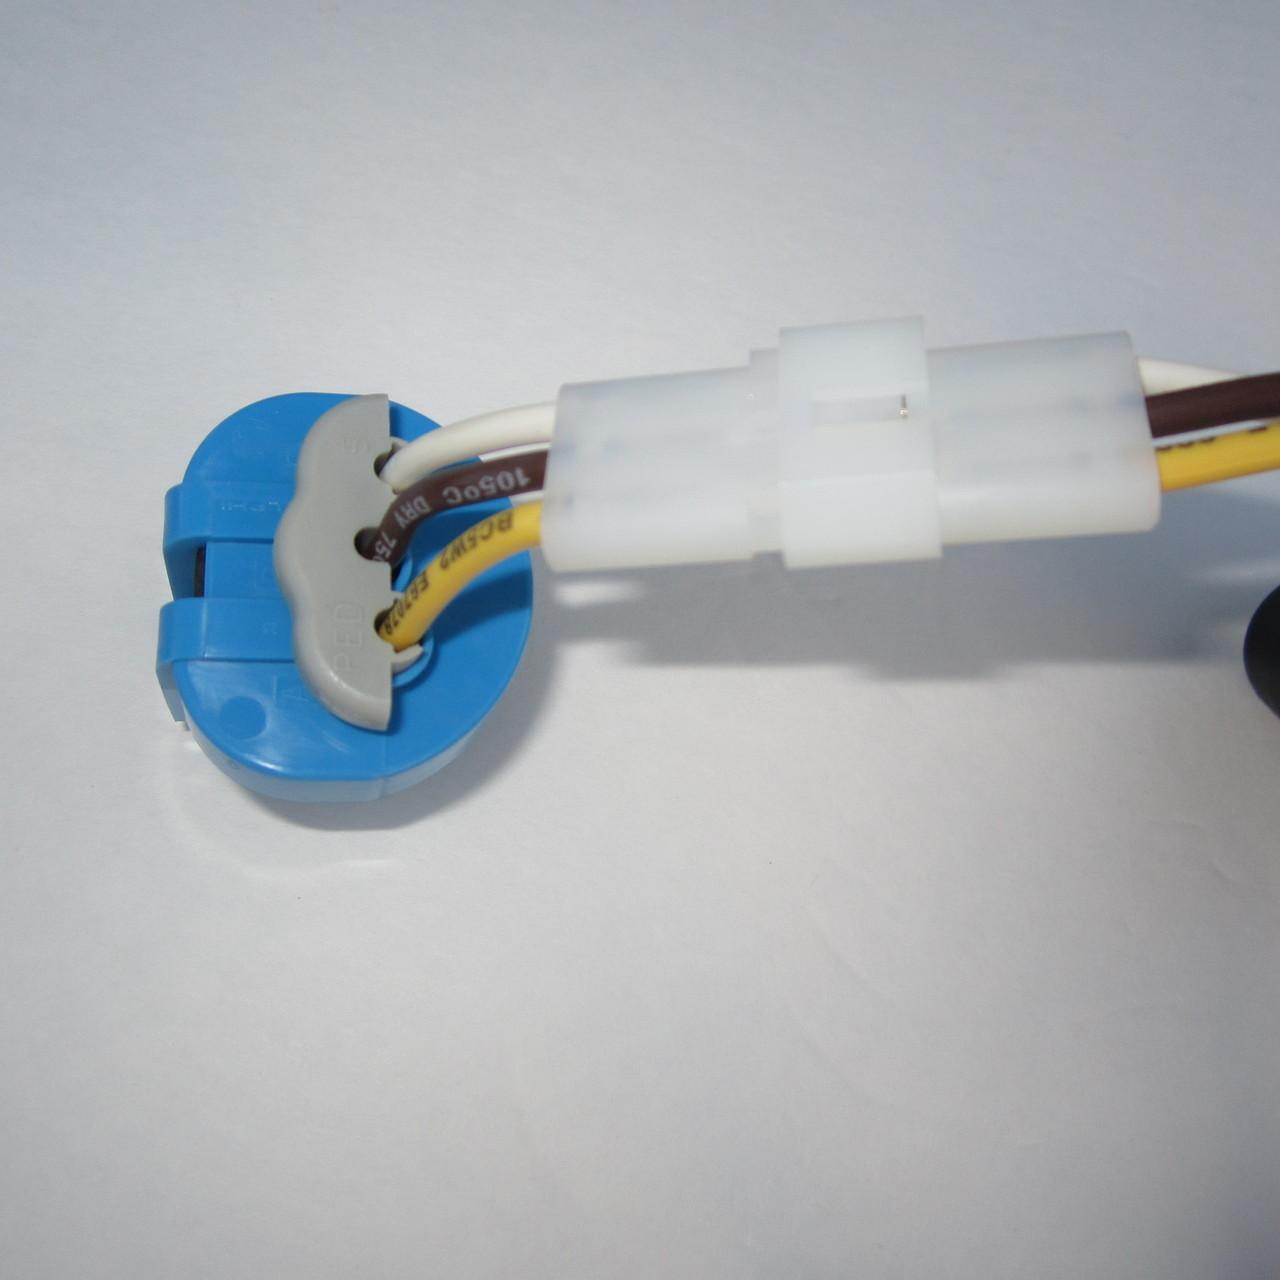 Brand New, Complete Jetta Headlight Wiring Harness 1999 - 2005 VW MK4 Genuine OE Parts - socket back